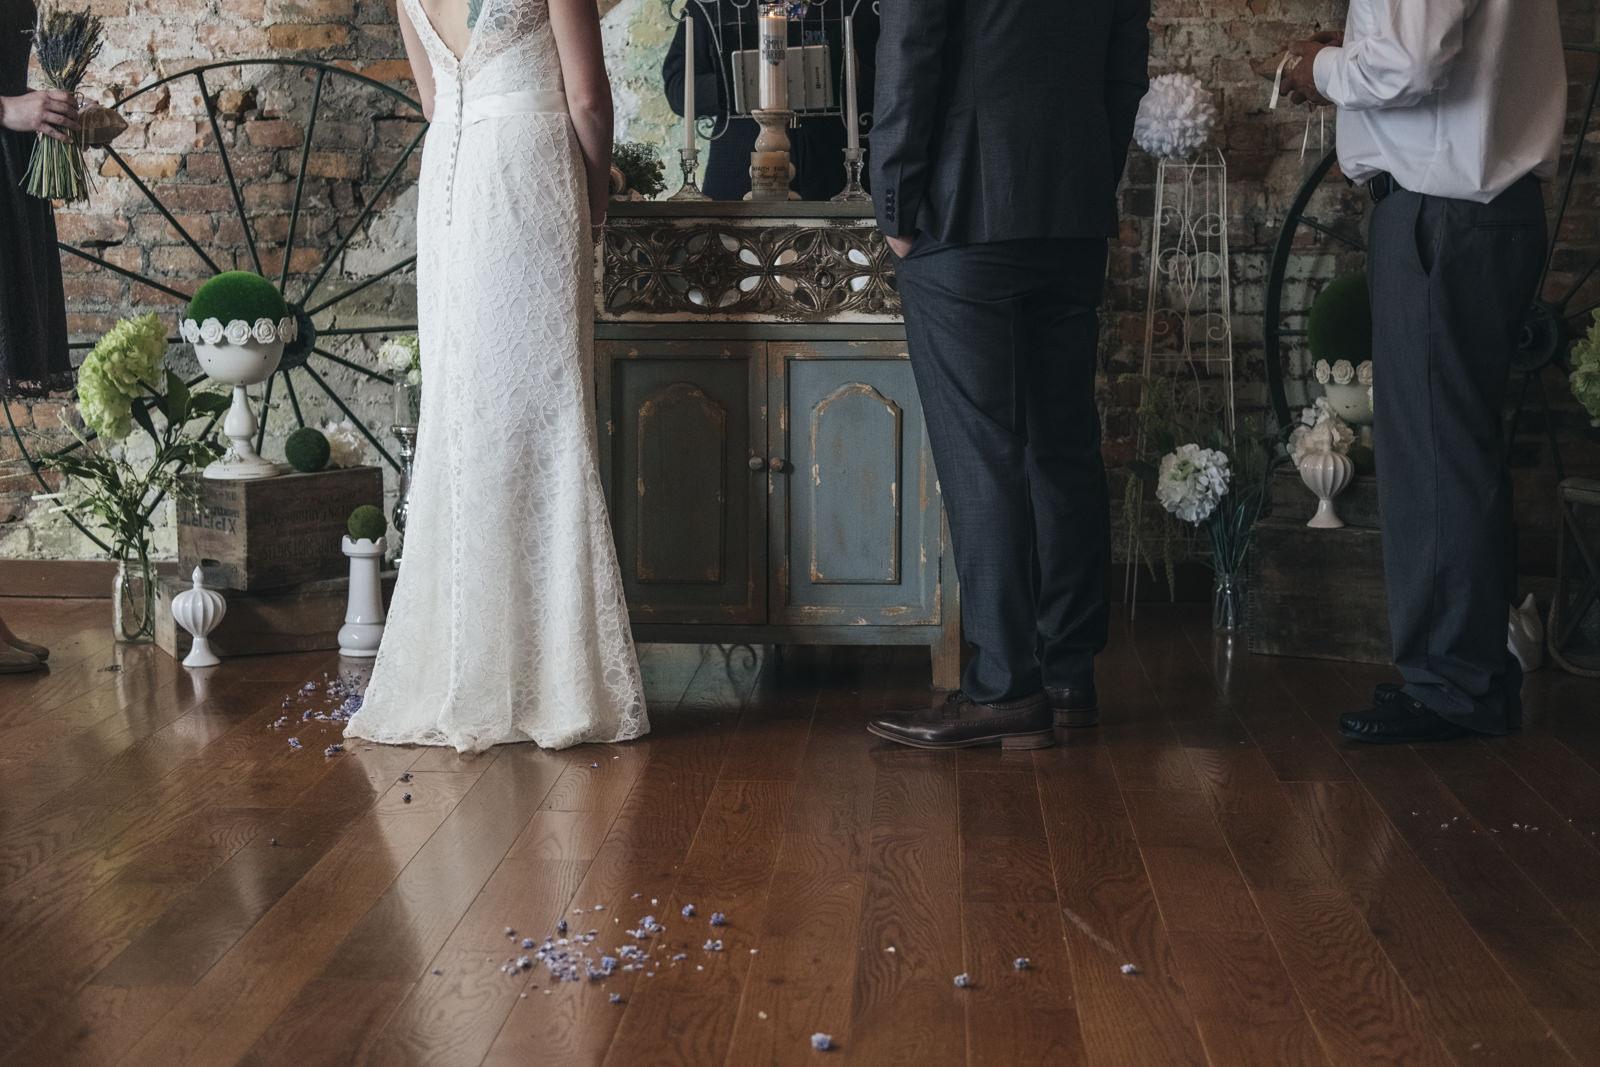 Ceremony in Simply Married in Toledo, Ohio.